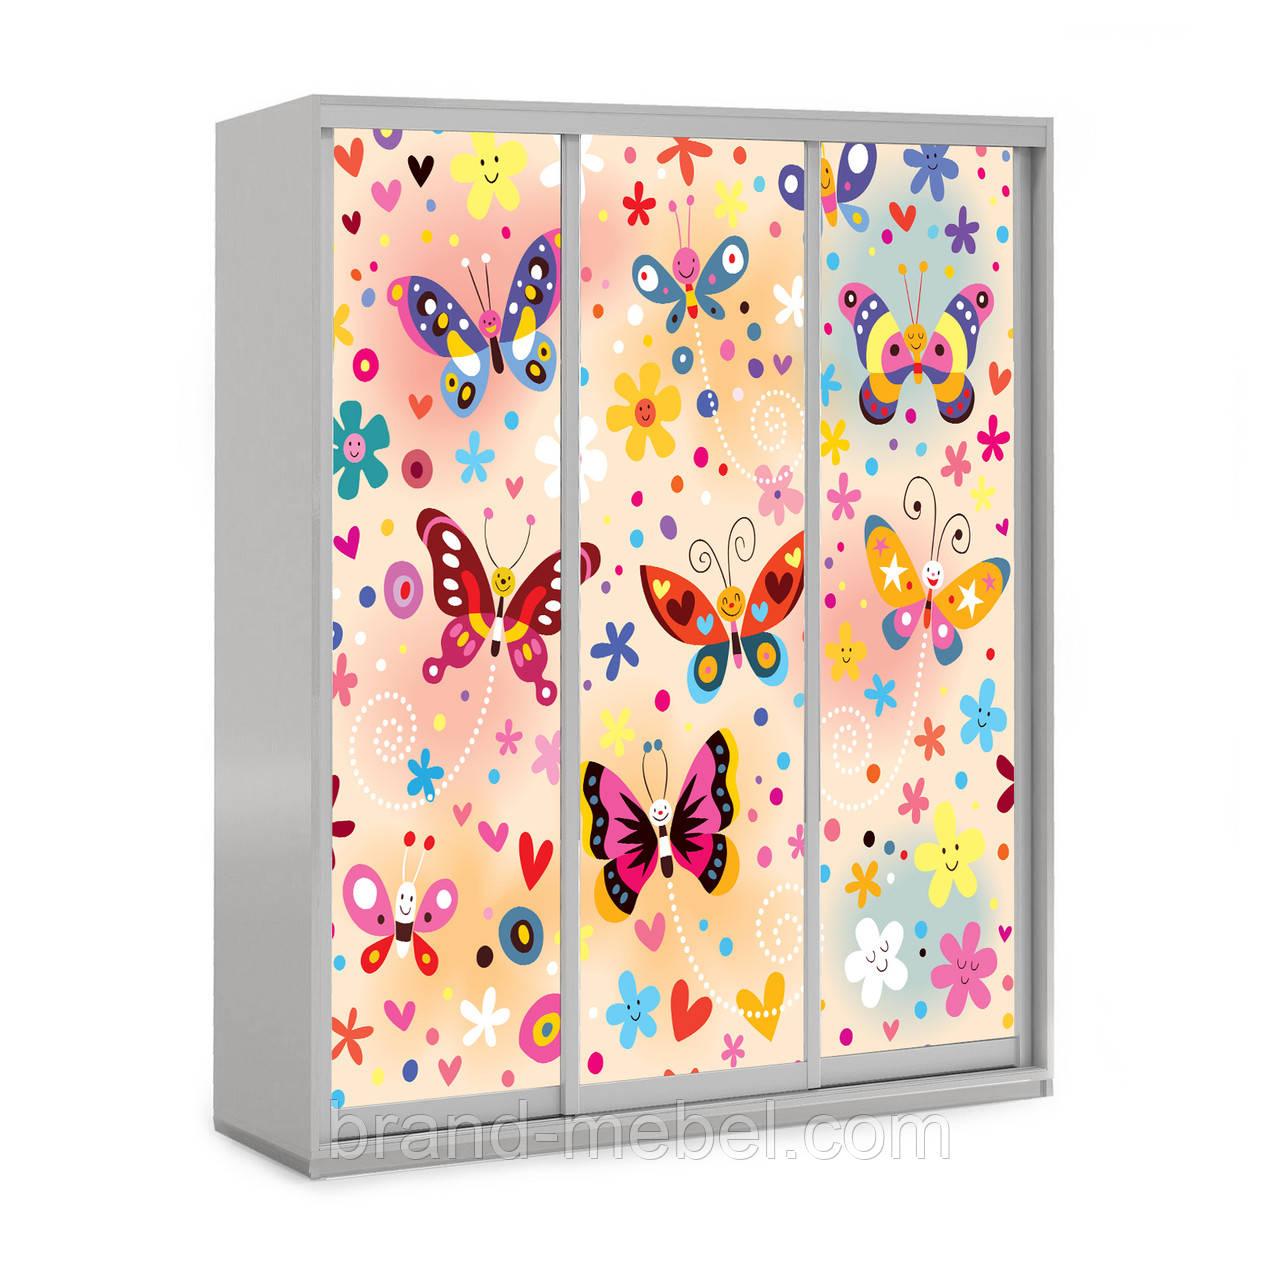 Детский шкаф-купе Бабочки